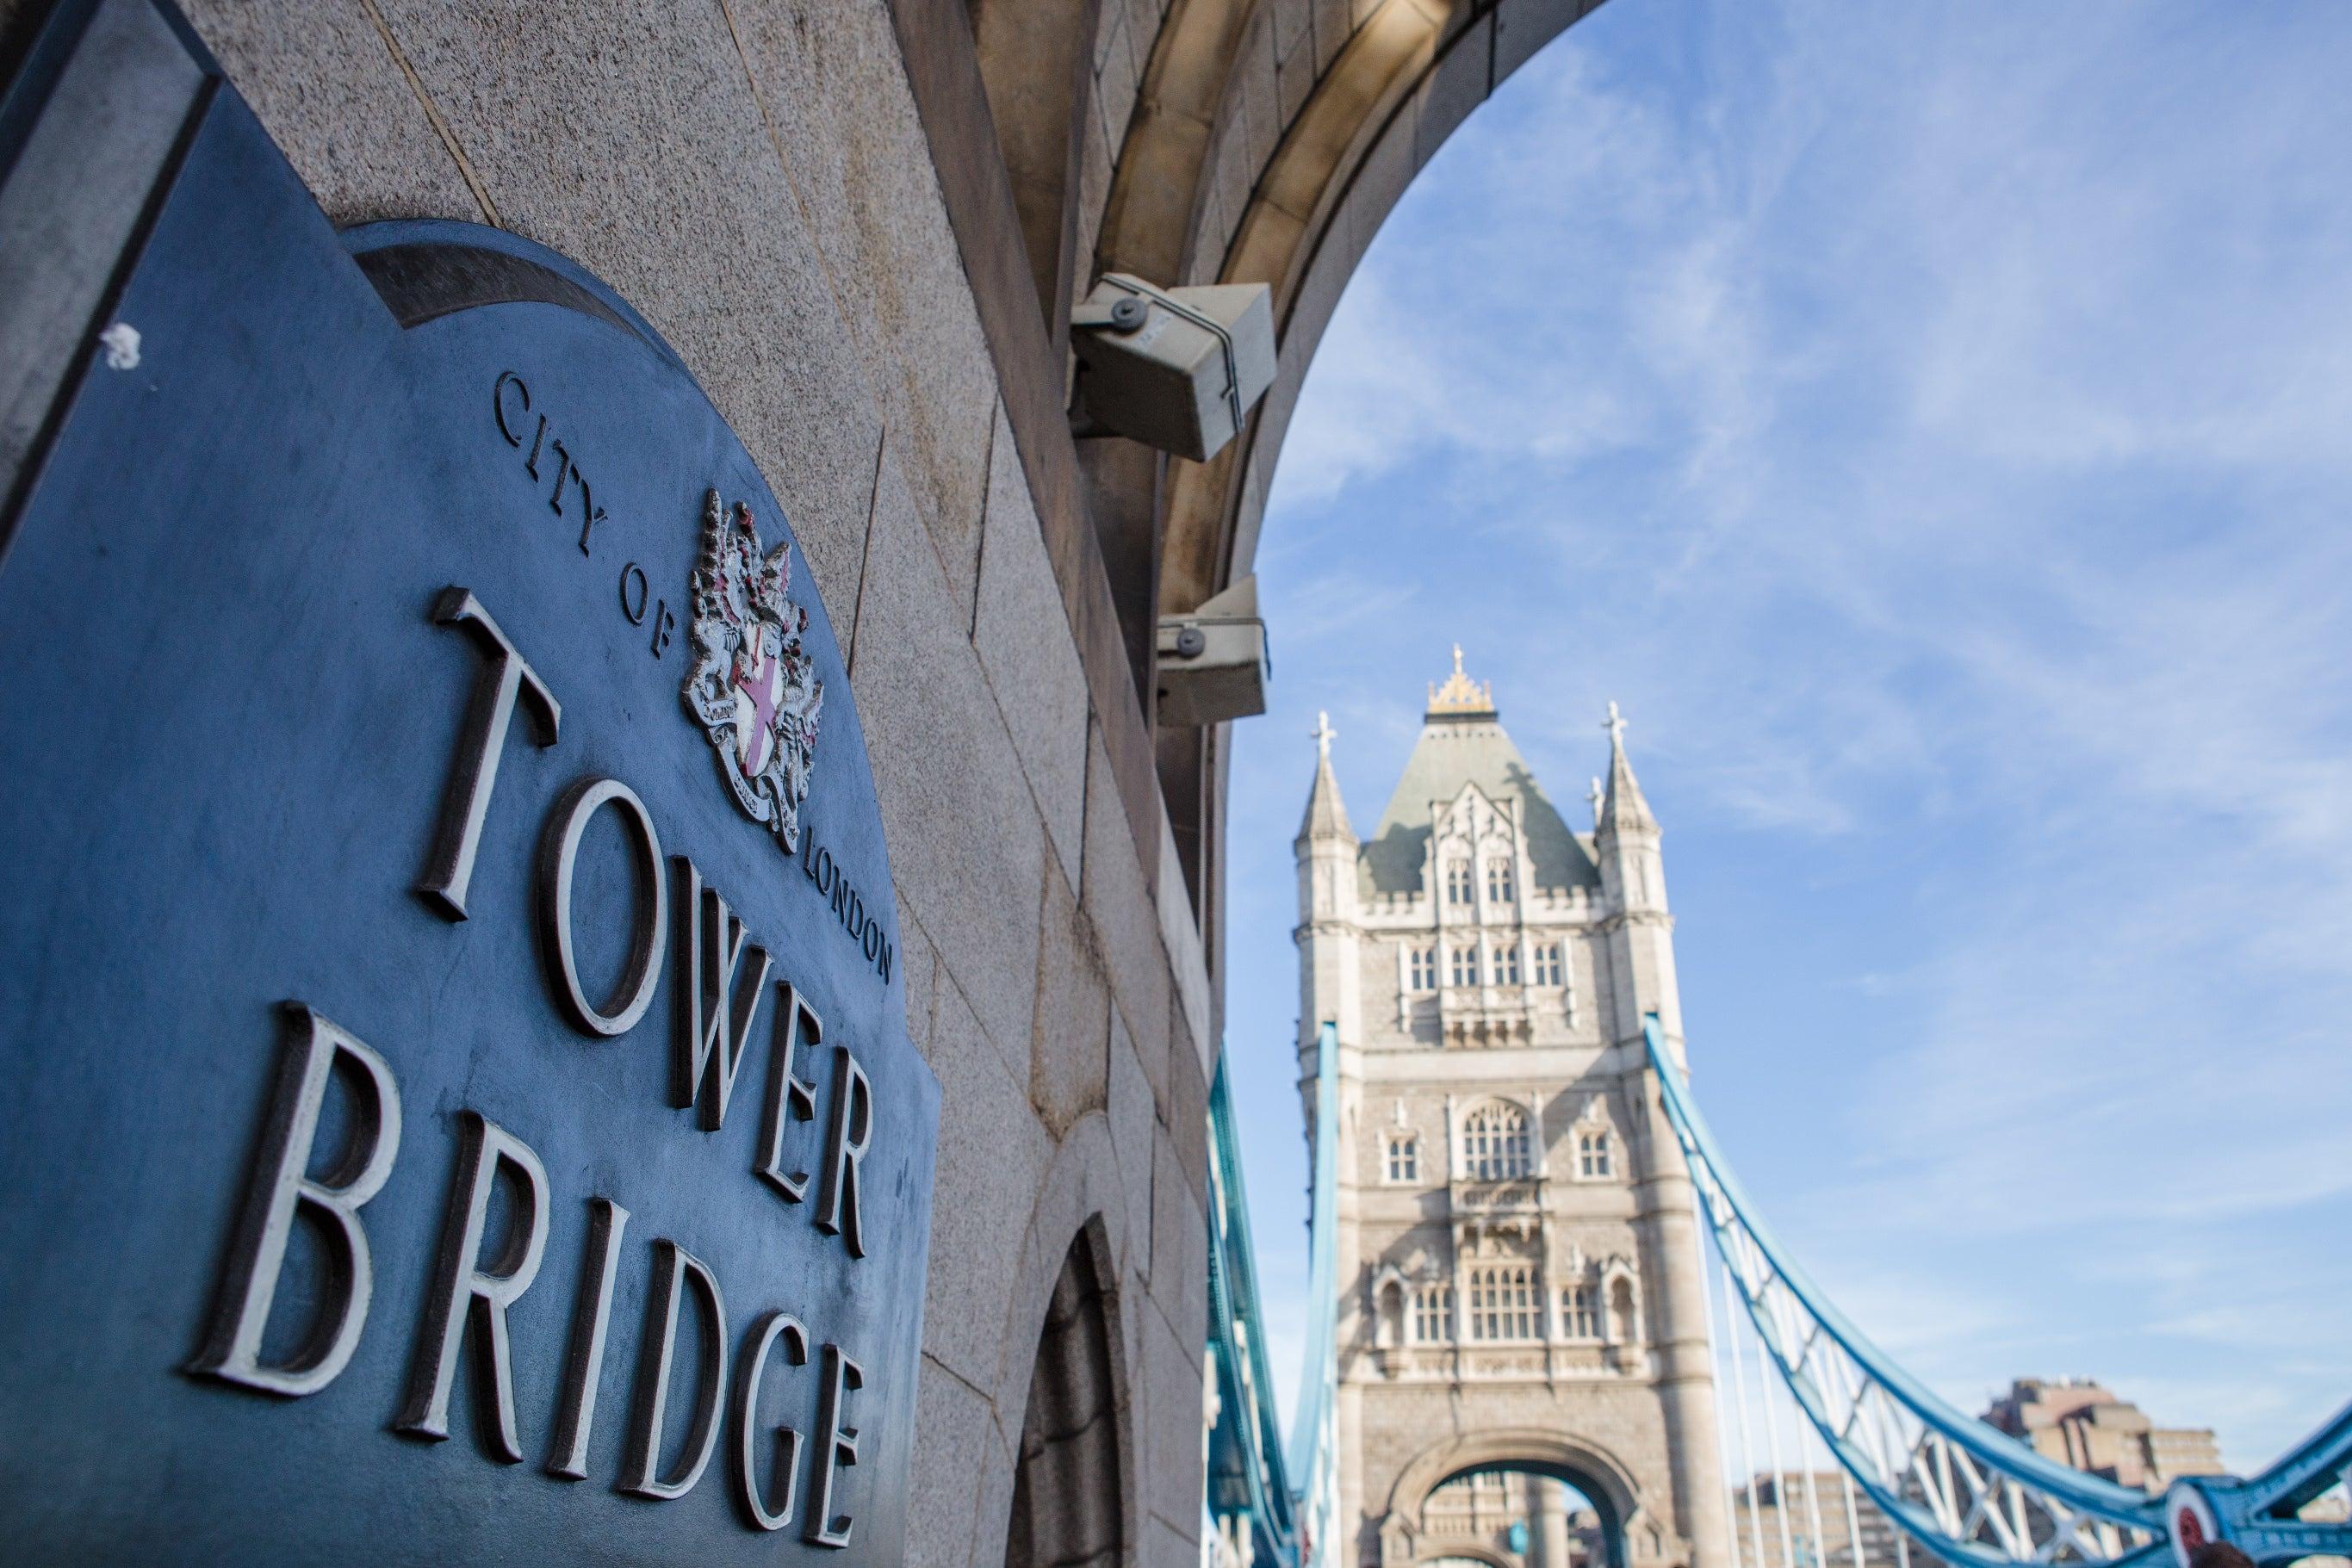 Tower Bridge Exhibition